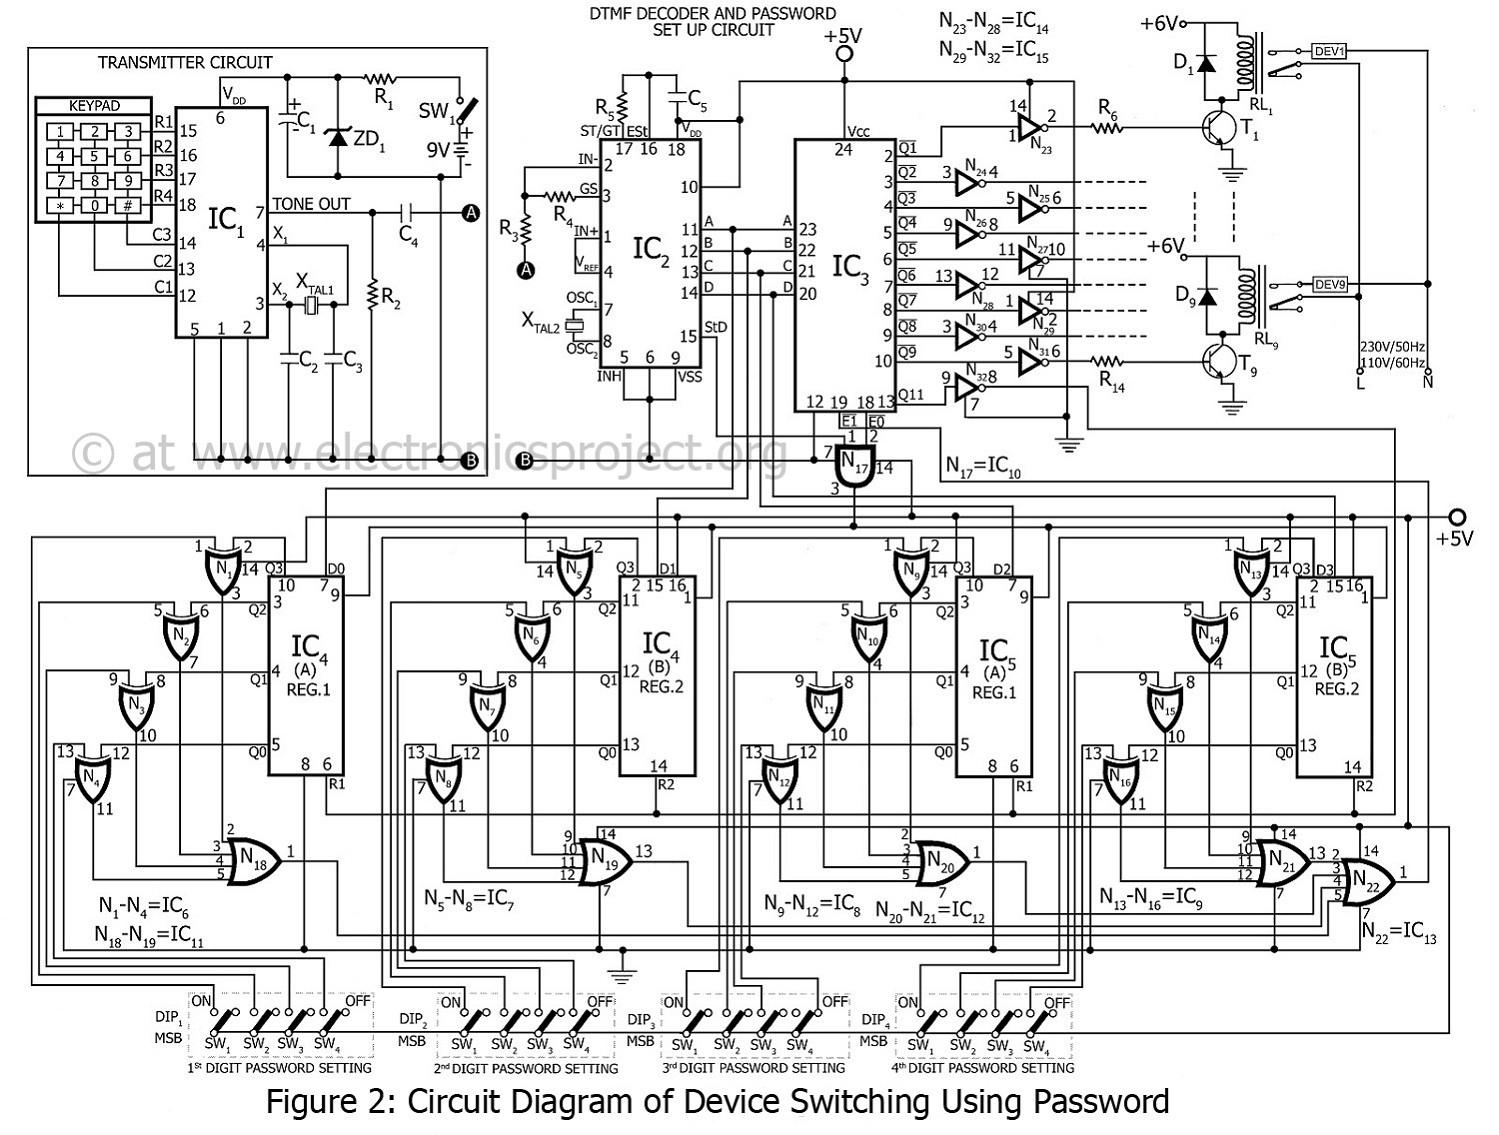 [DIAGRAM] Vdo Mux Wiring Diagram FULL Version HD Quality